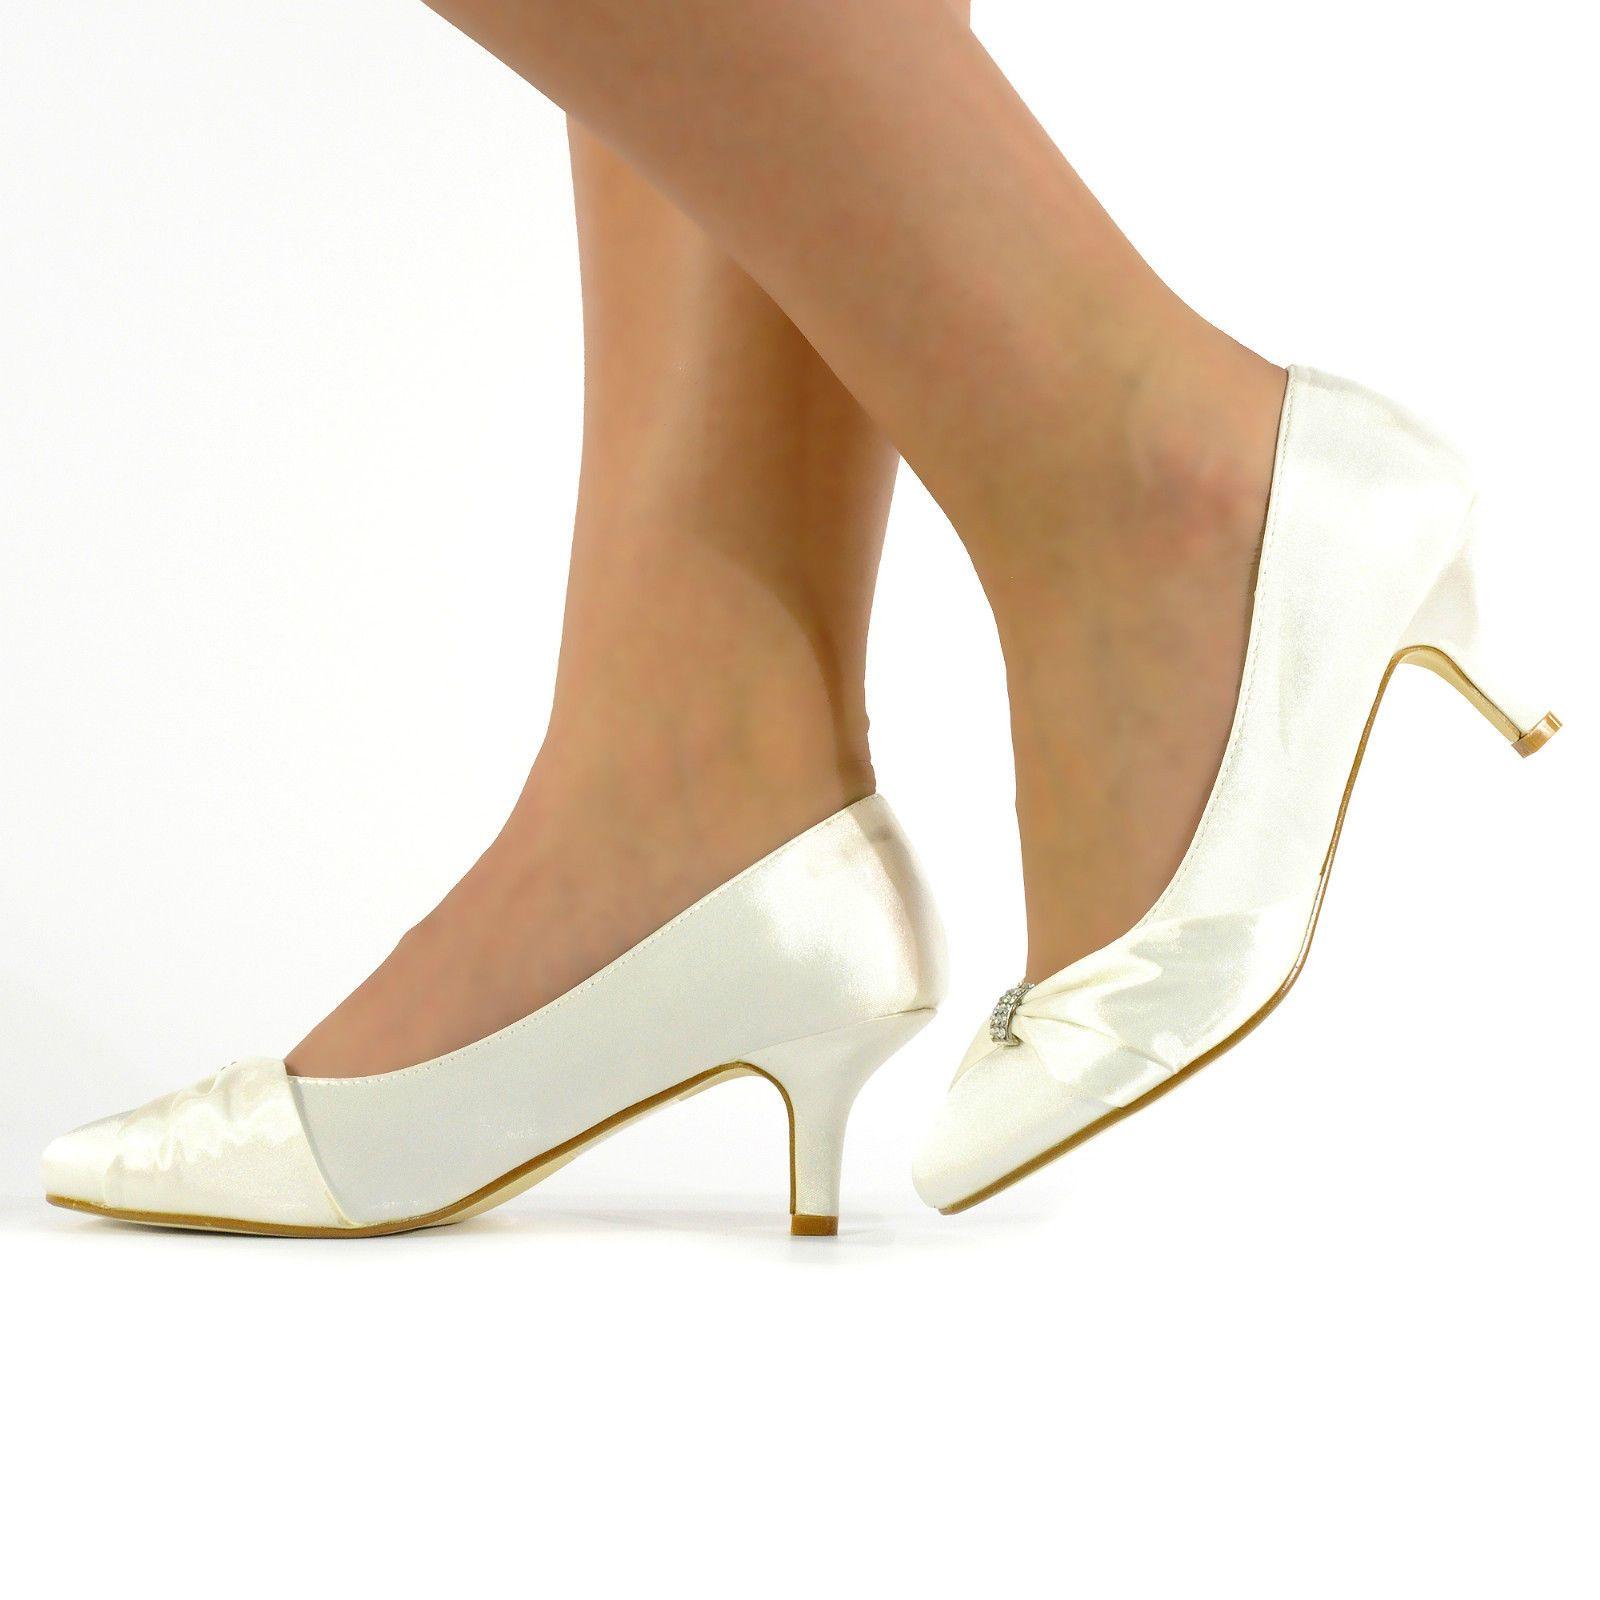 Ladies Womens Wedding Shoes Bridal Bridemaids Prom Diamante Ivory Shoes Size